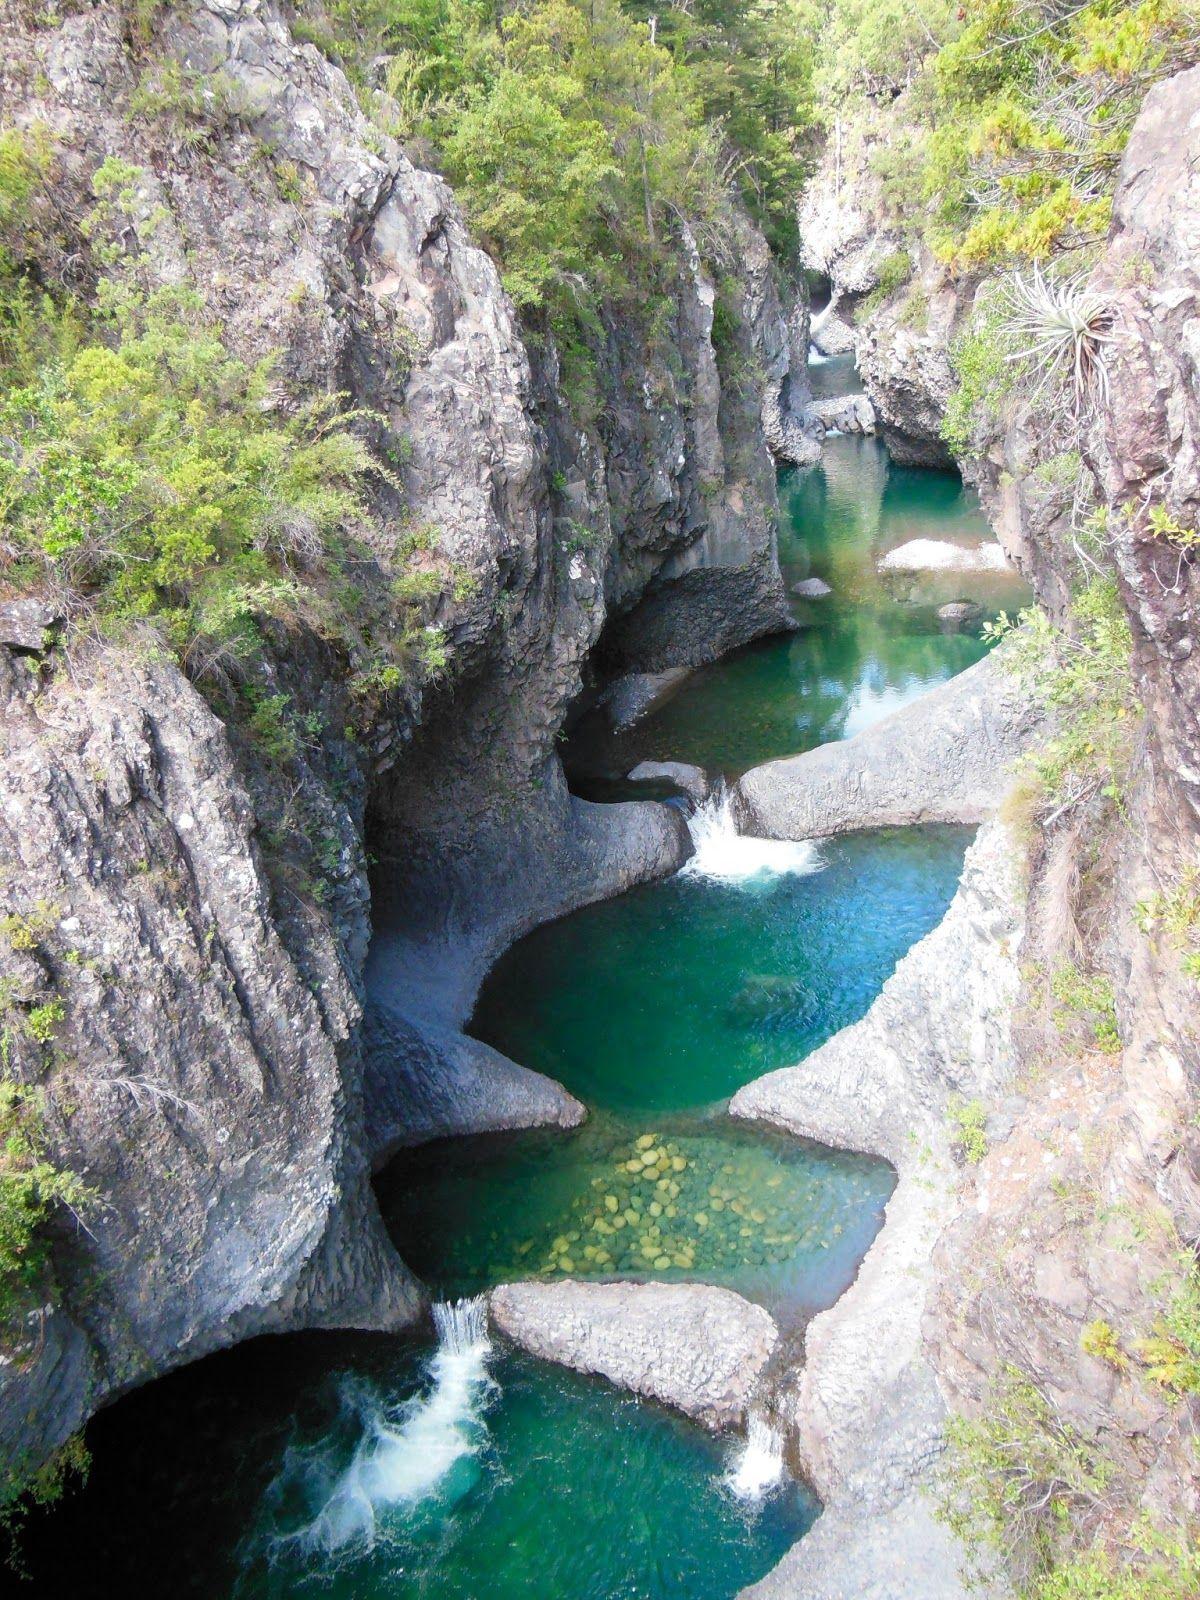 Beautiful Niagara Falls Wallpaper National Park Radal Quot Las Siete Tazas Quot Chile Via